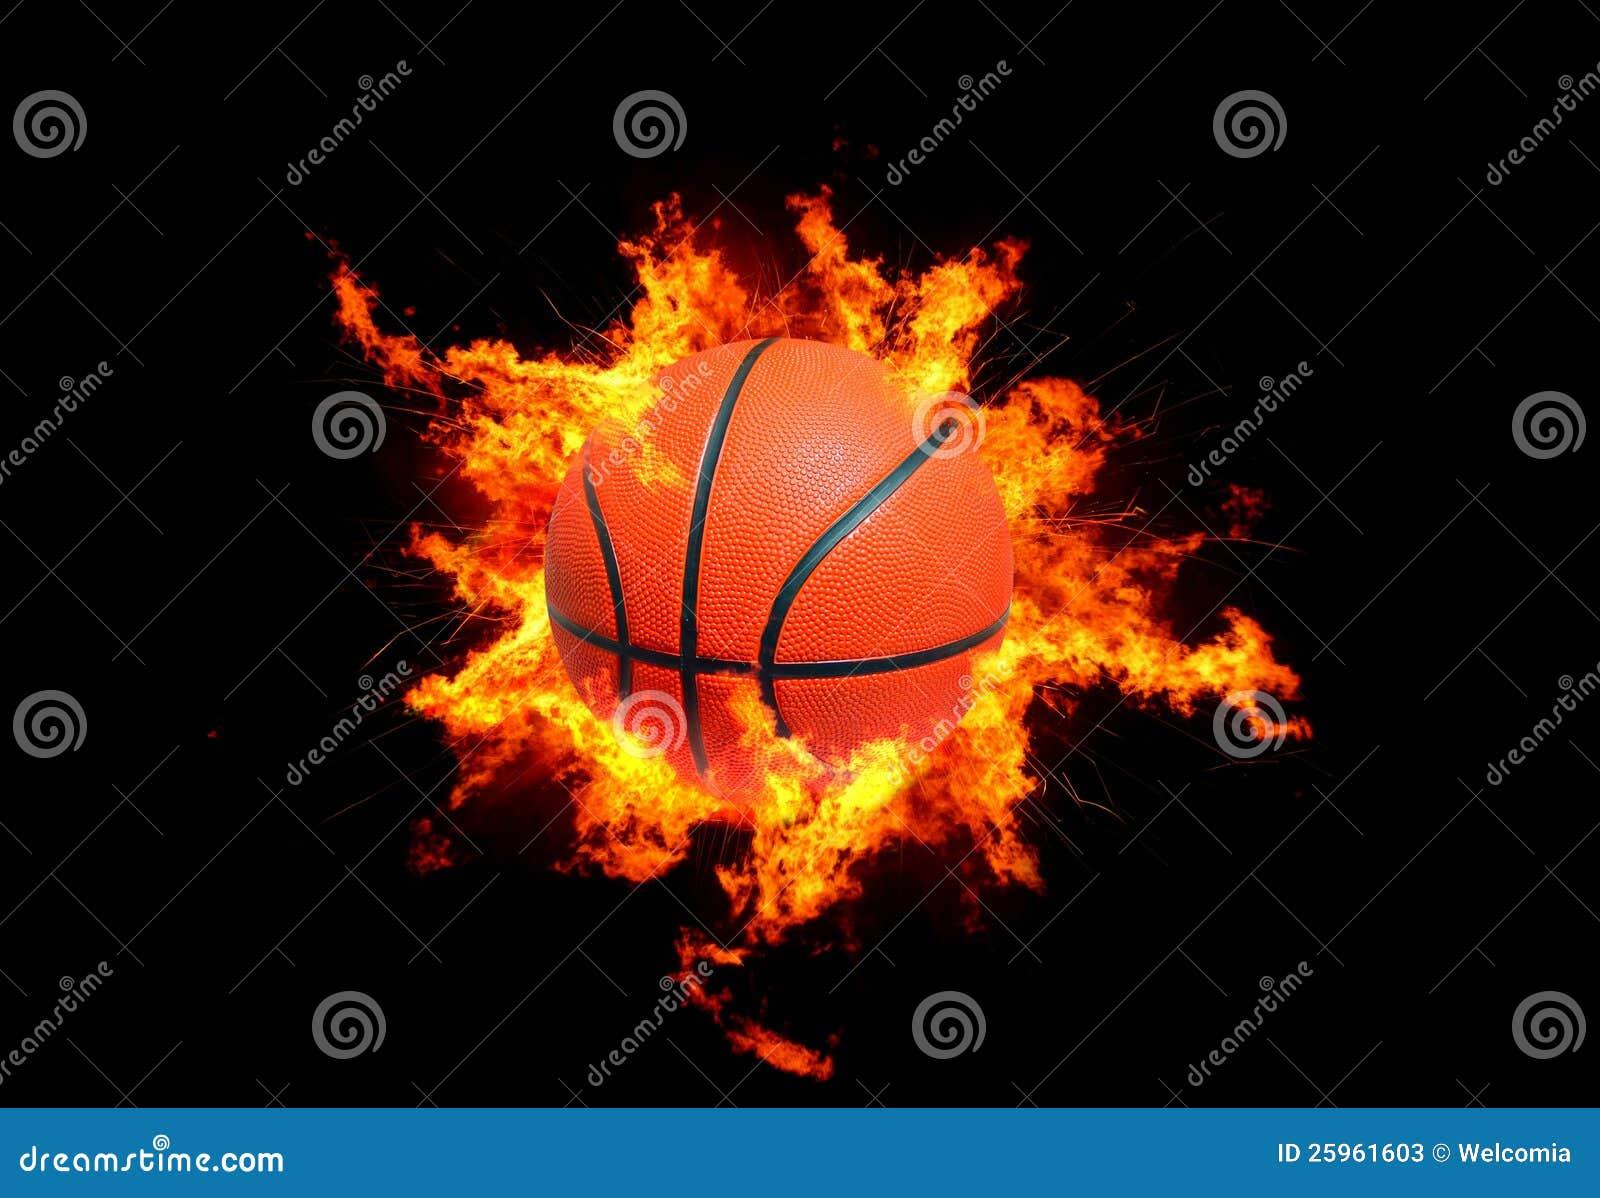 Basketbal in Vlammen